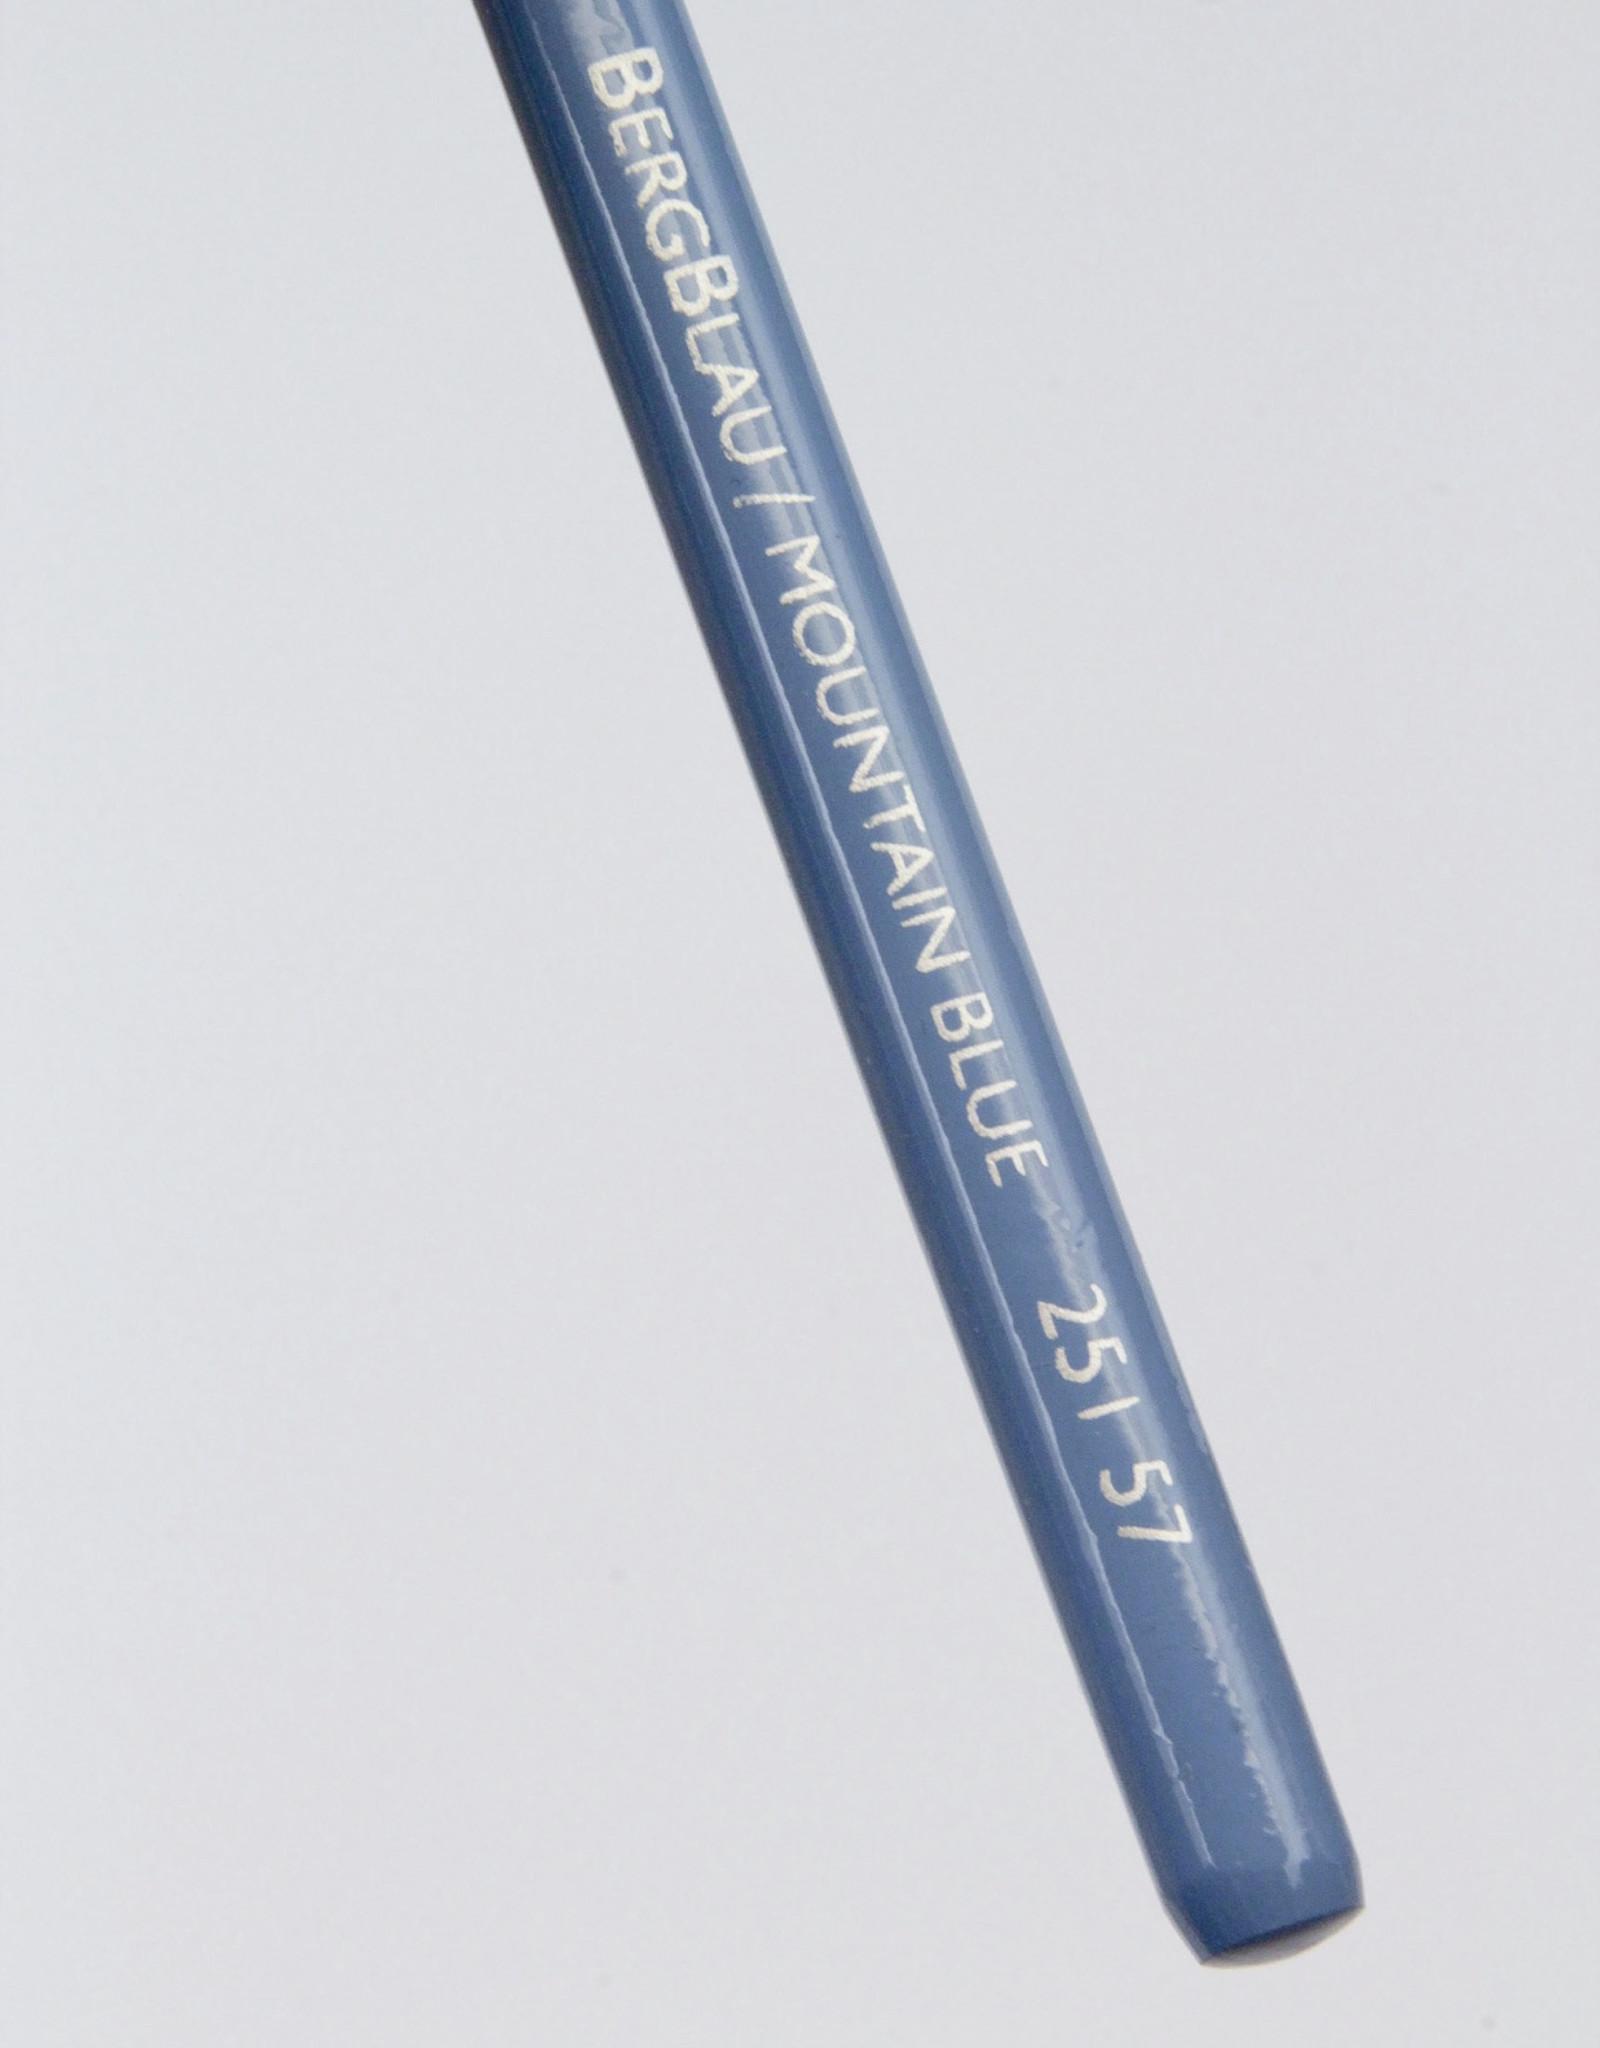 Cretacolor, Aqua Monolith Pencil, Mountain Blue